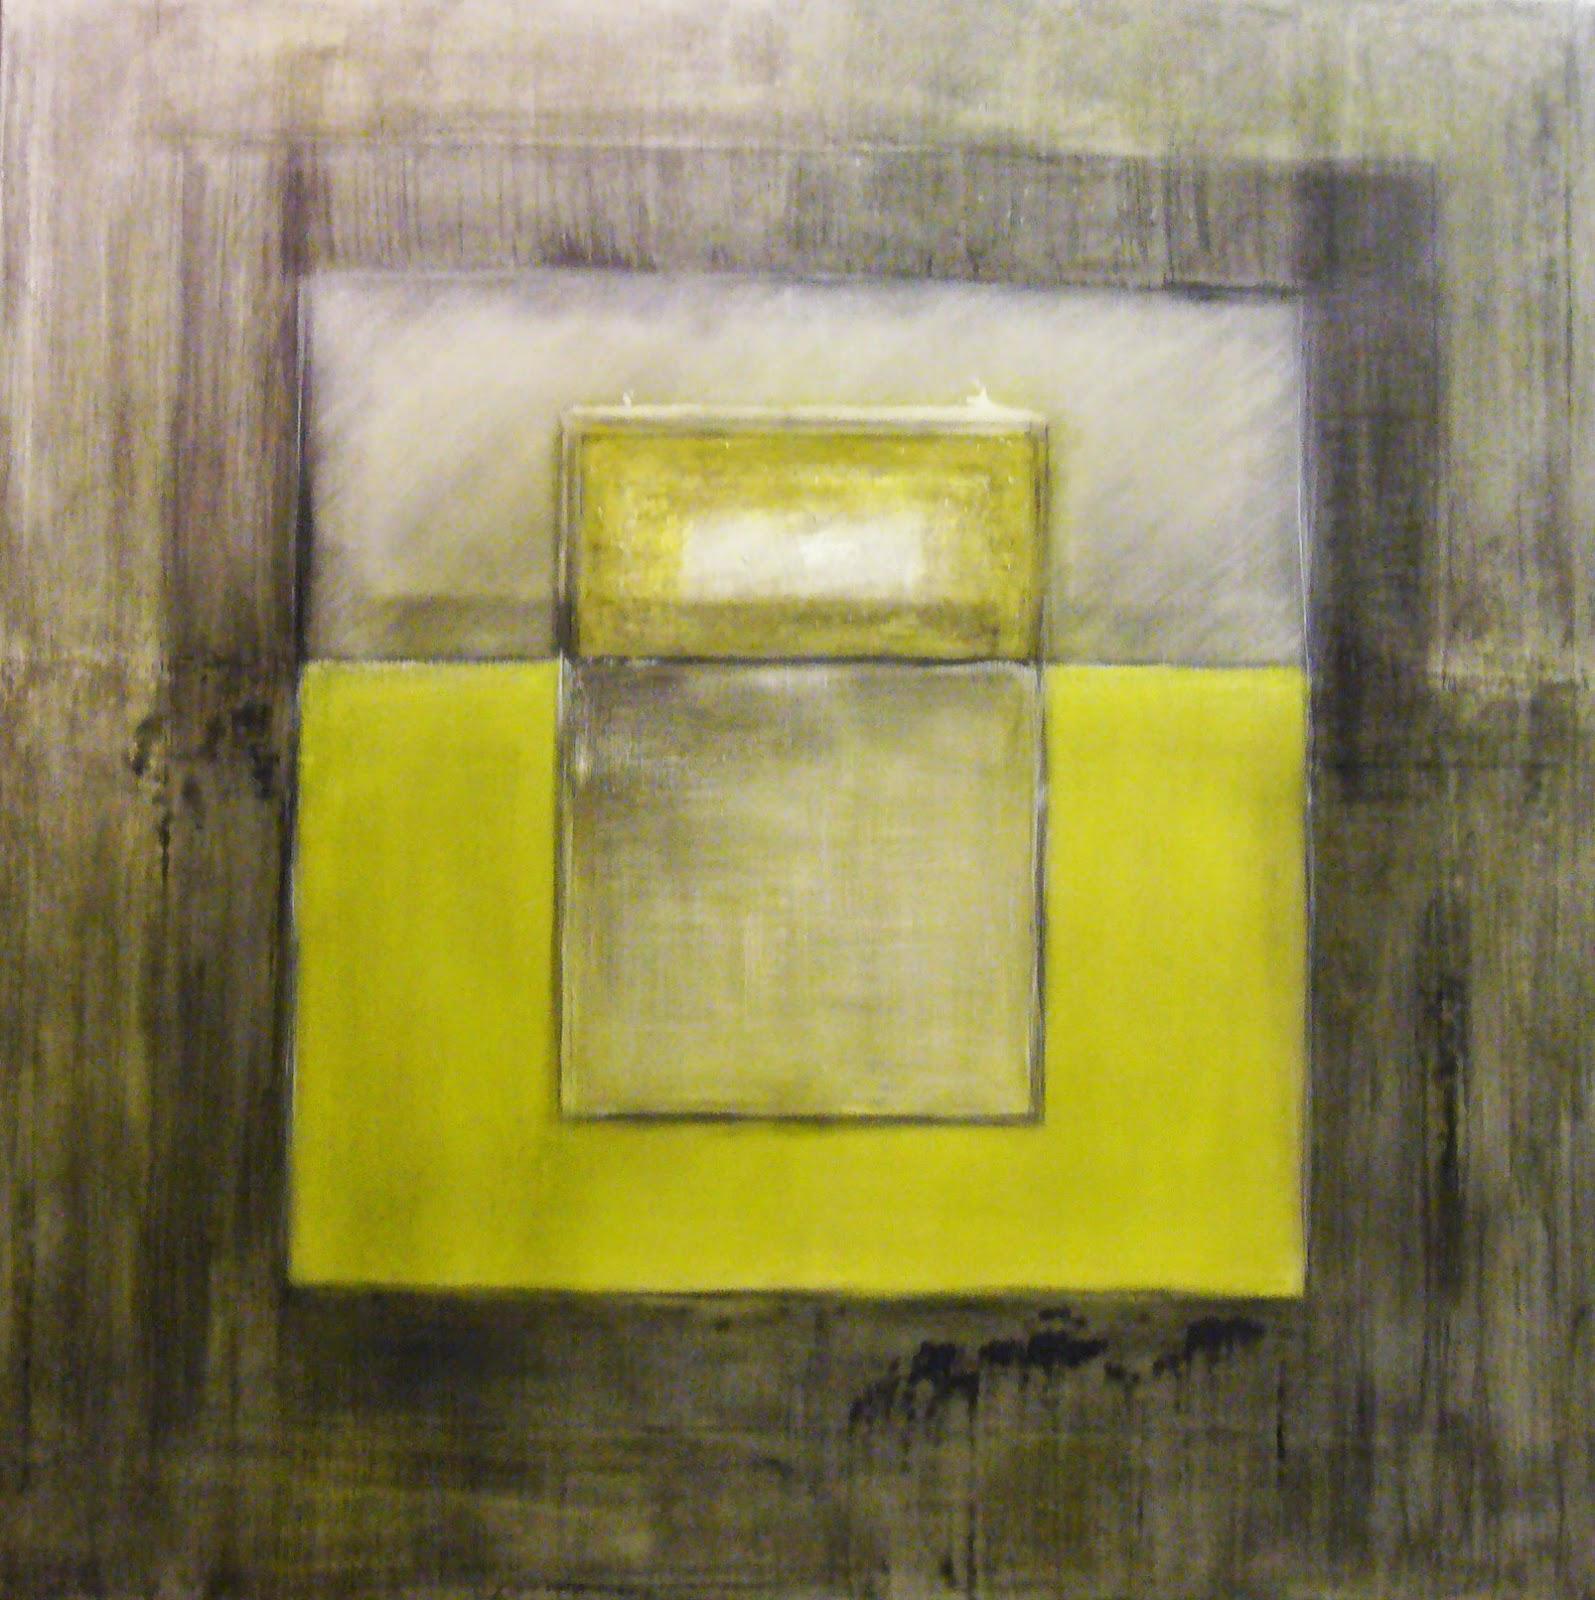 Pinturas abstractas de vanina martinez cuadrados for Comprar cuadros modernos online